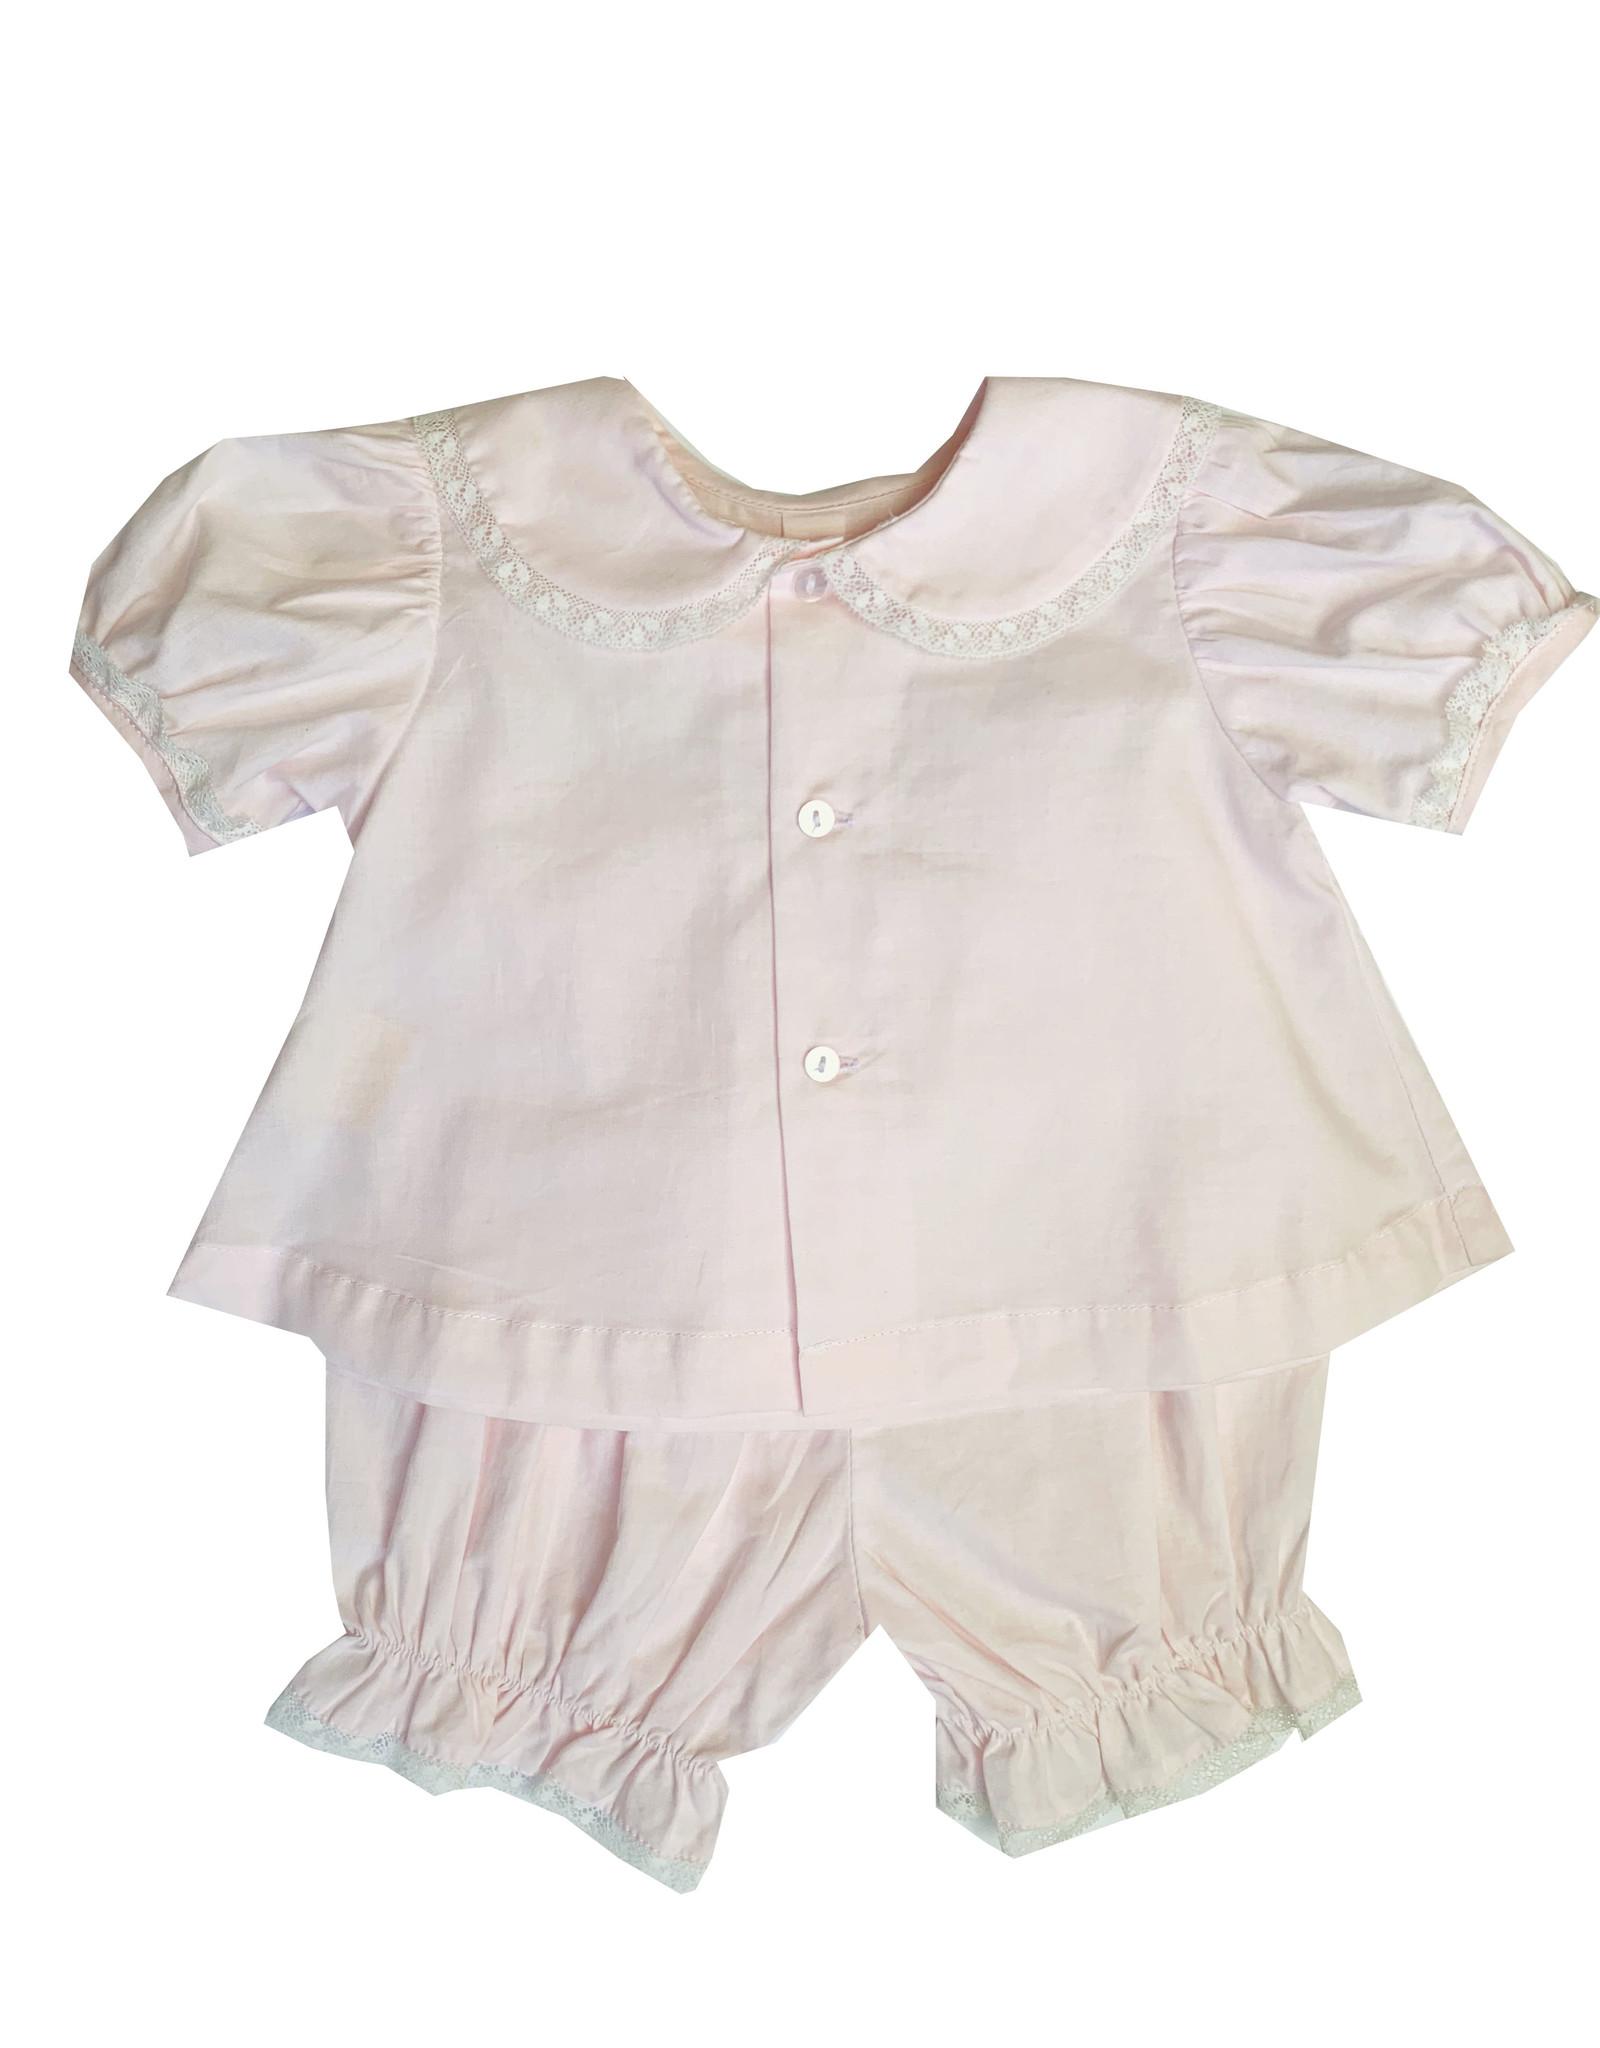 LullabySet Pink Adorable Diaper Set